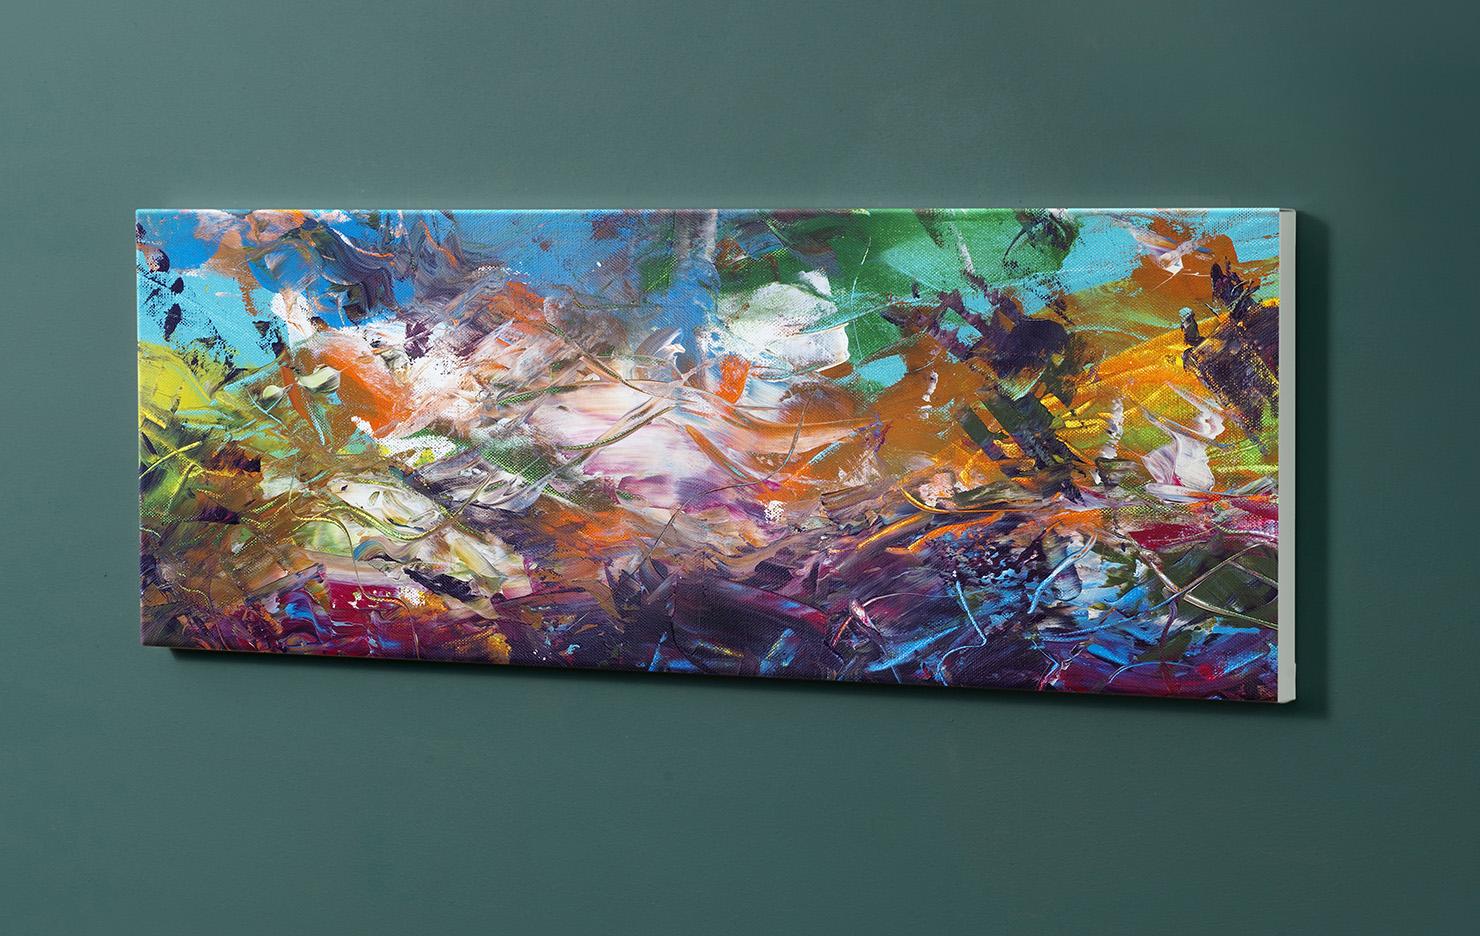 Magnettafel NOTIZ 90x30cm Motiv-Pinnwand M119 Abstrakt Kunst